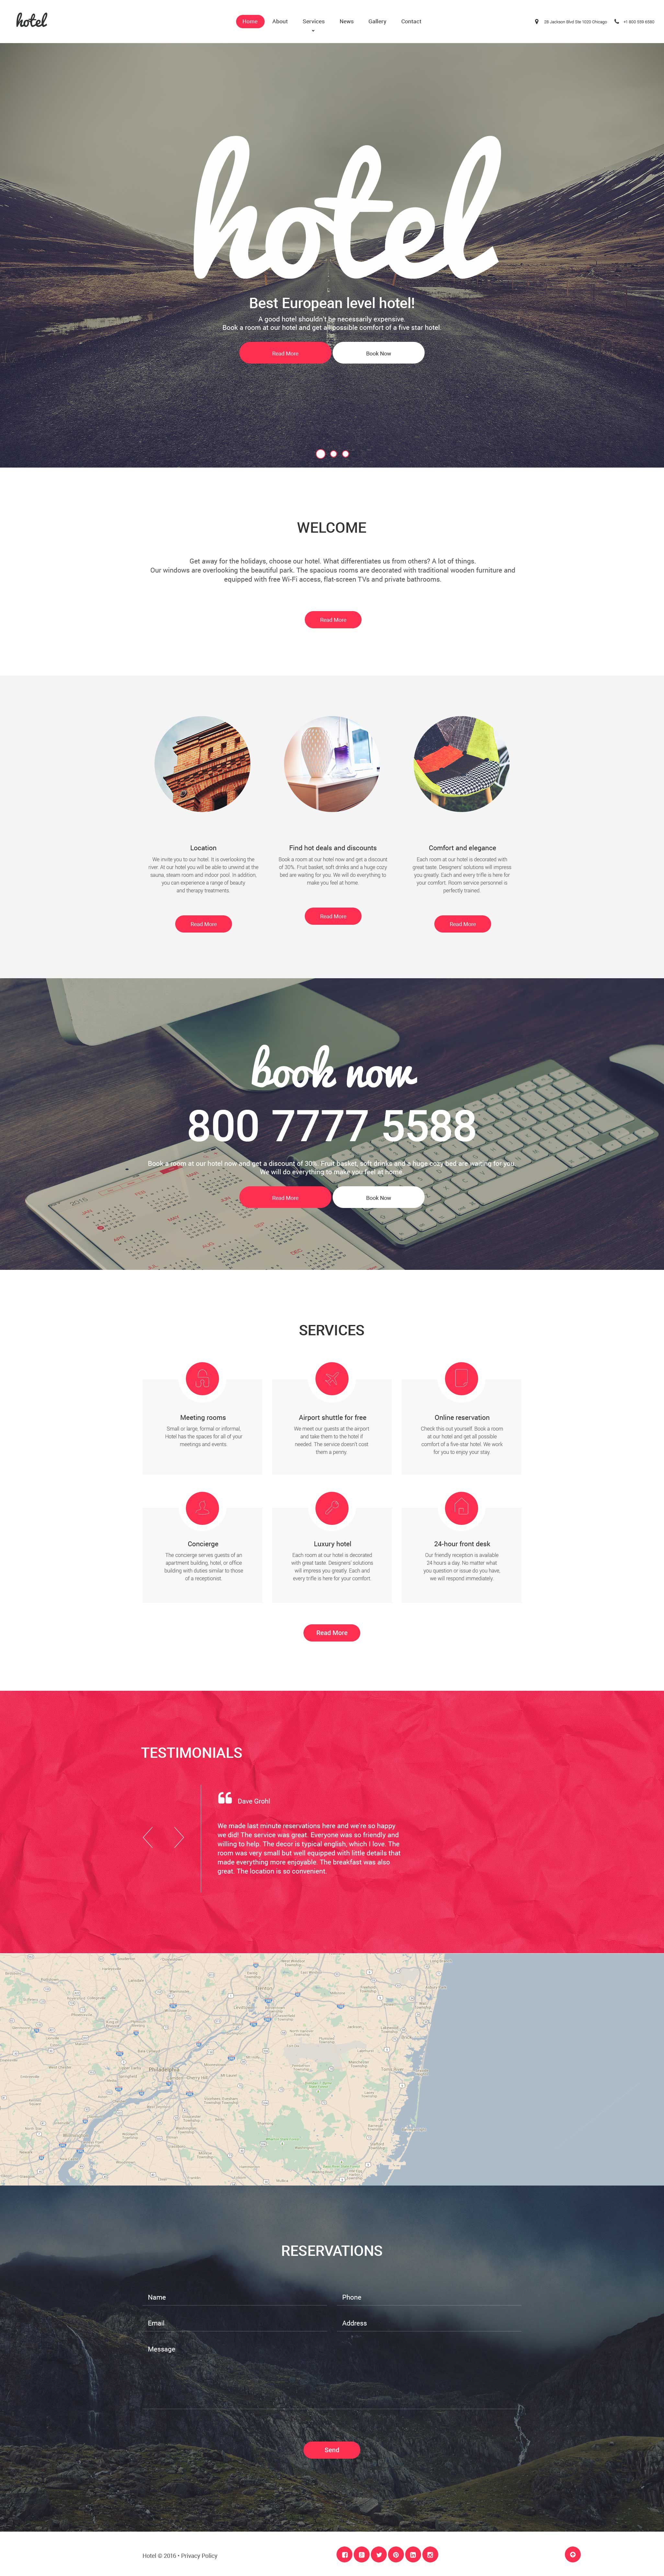 Wordpress Template Hotel Web Inspiration Web Design Wordpress Template